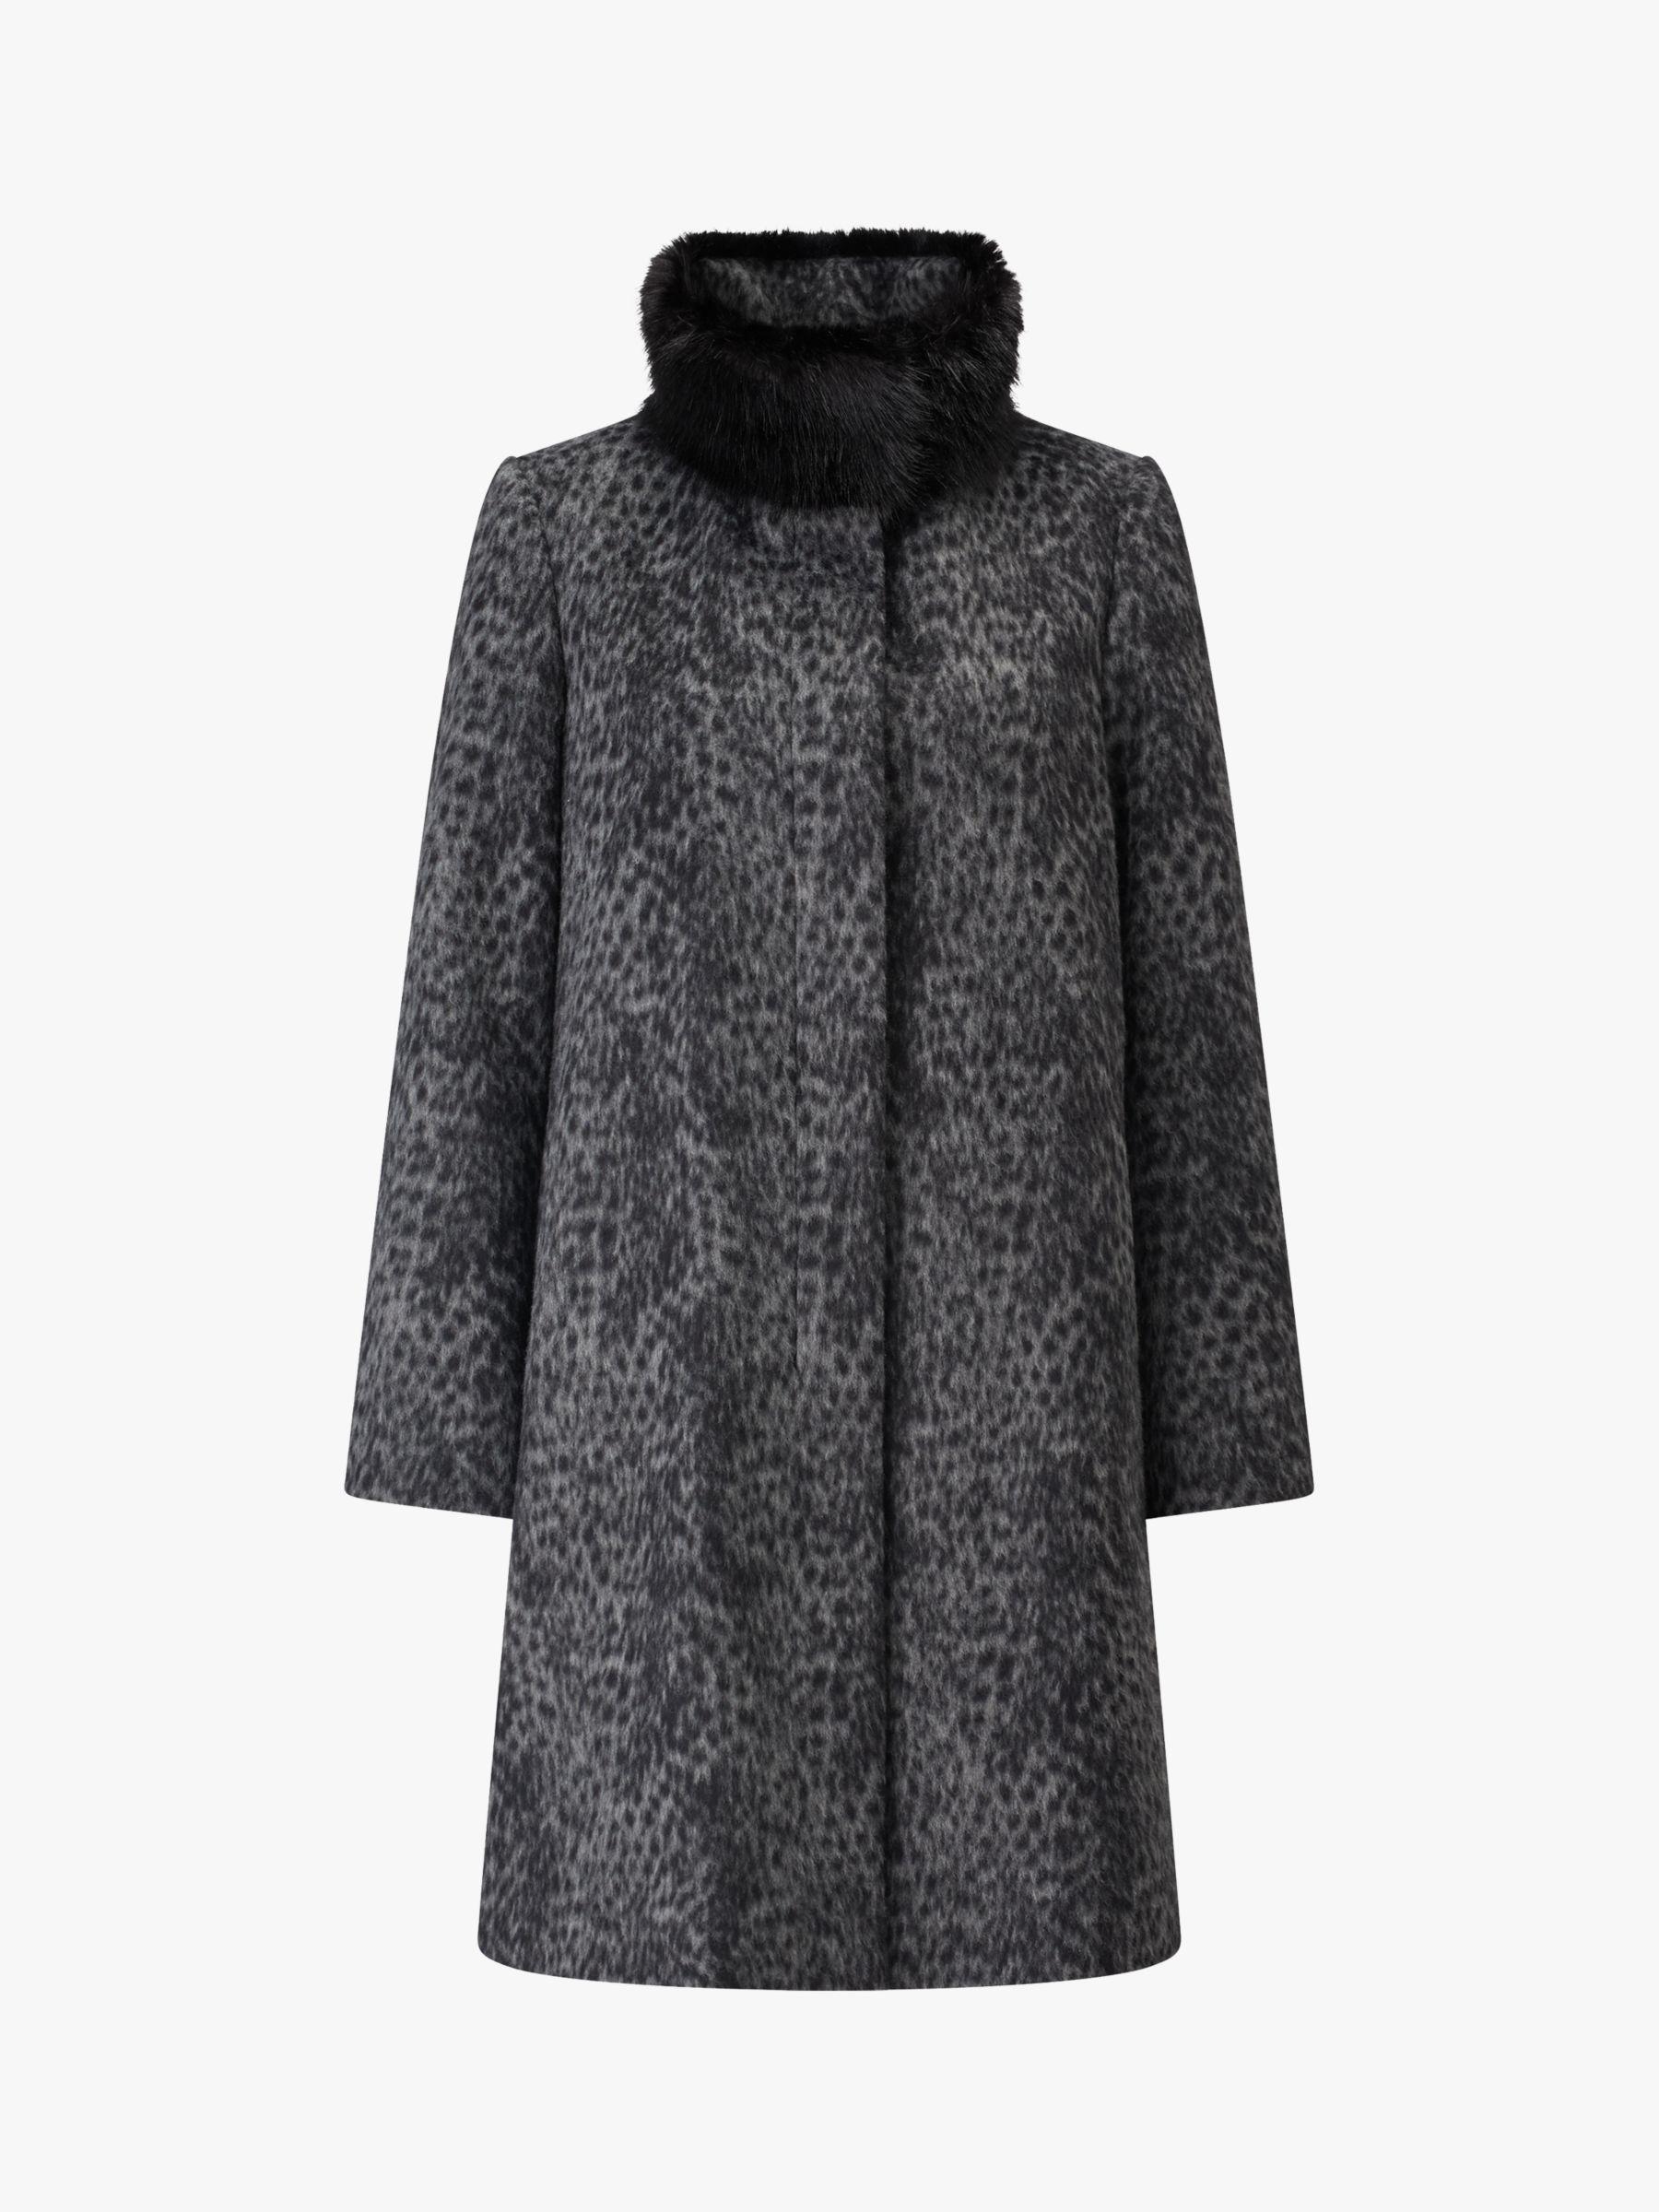 Four Seasons Four Seasons Leopard Print Fly Front Faux Fur Collar Coat, Grey